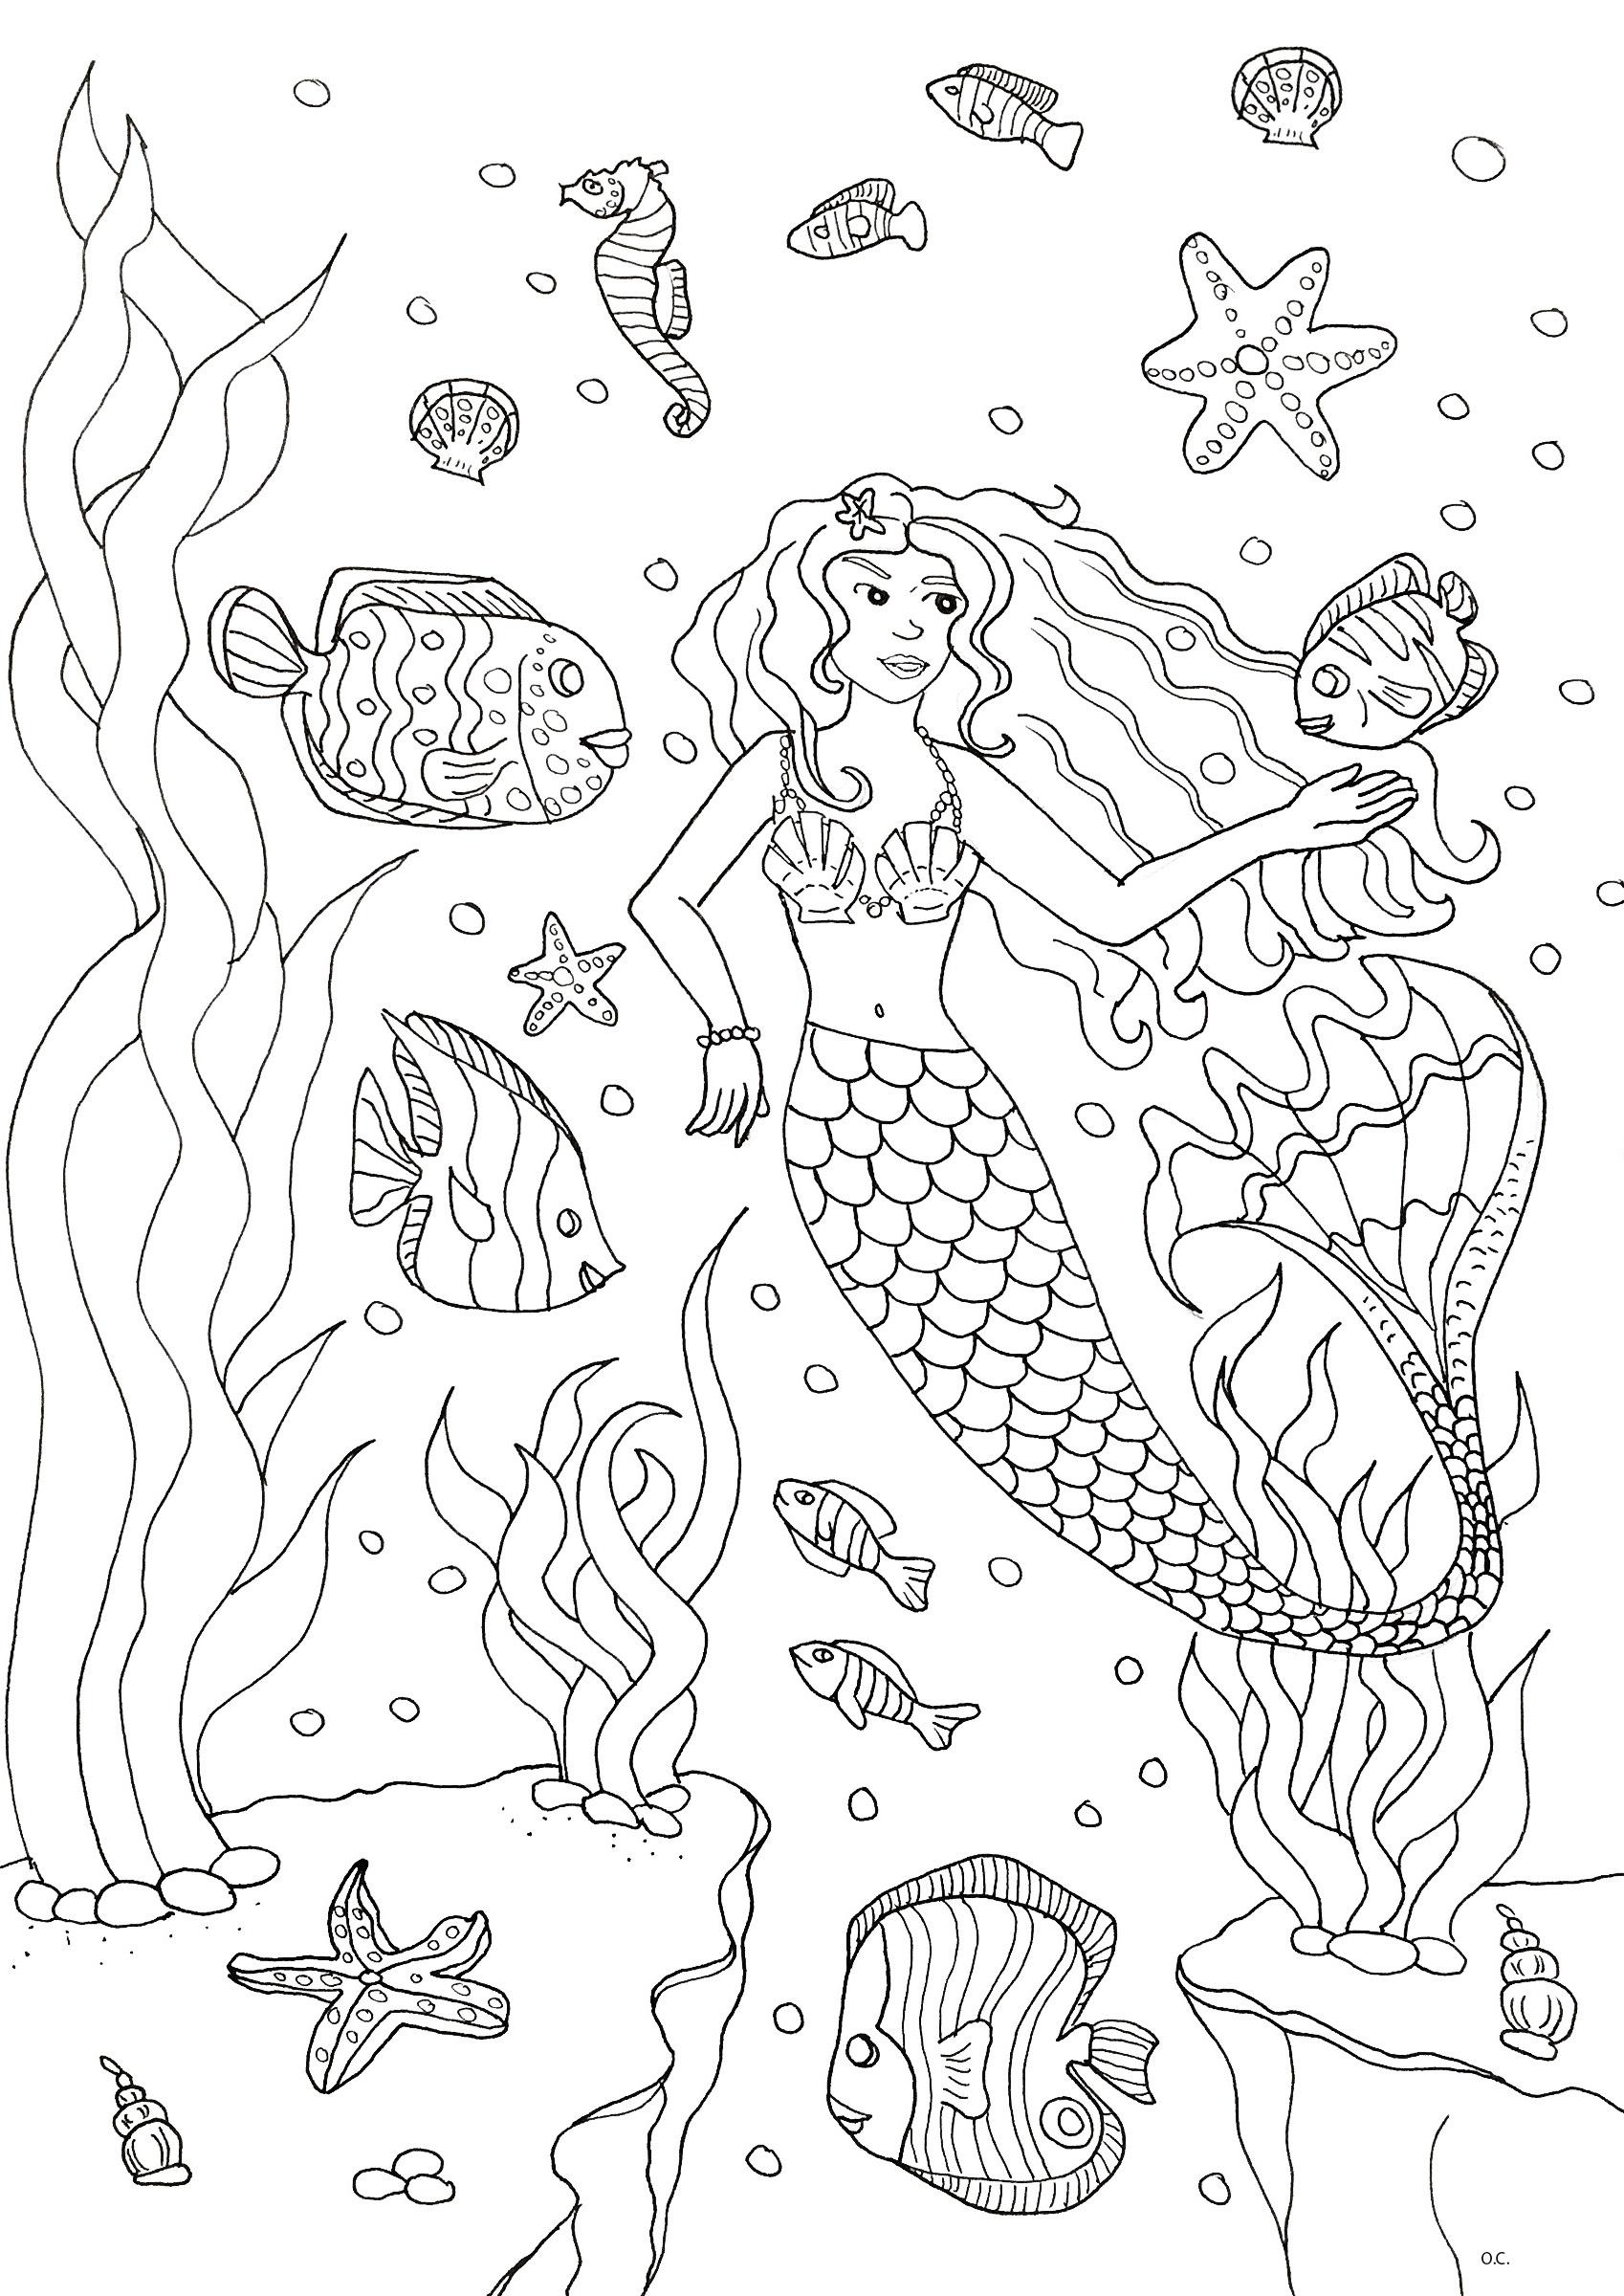 Malbuch Fur Erwachsene : Meerjungfrauen - 6